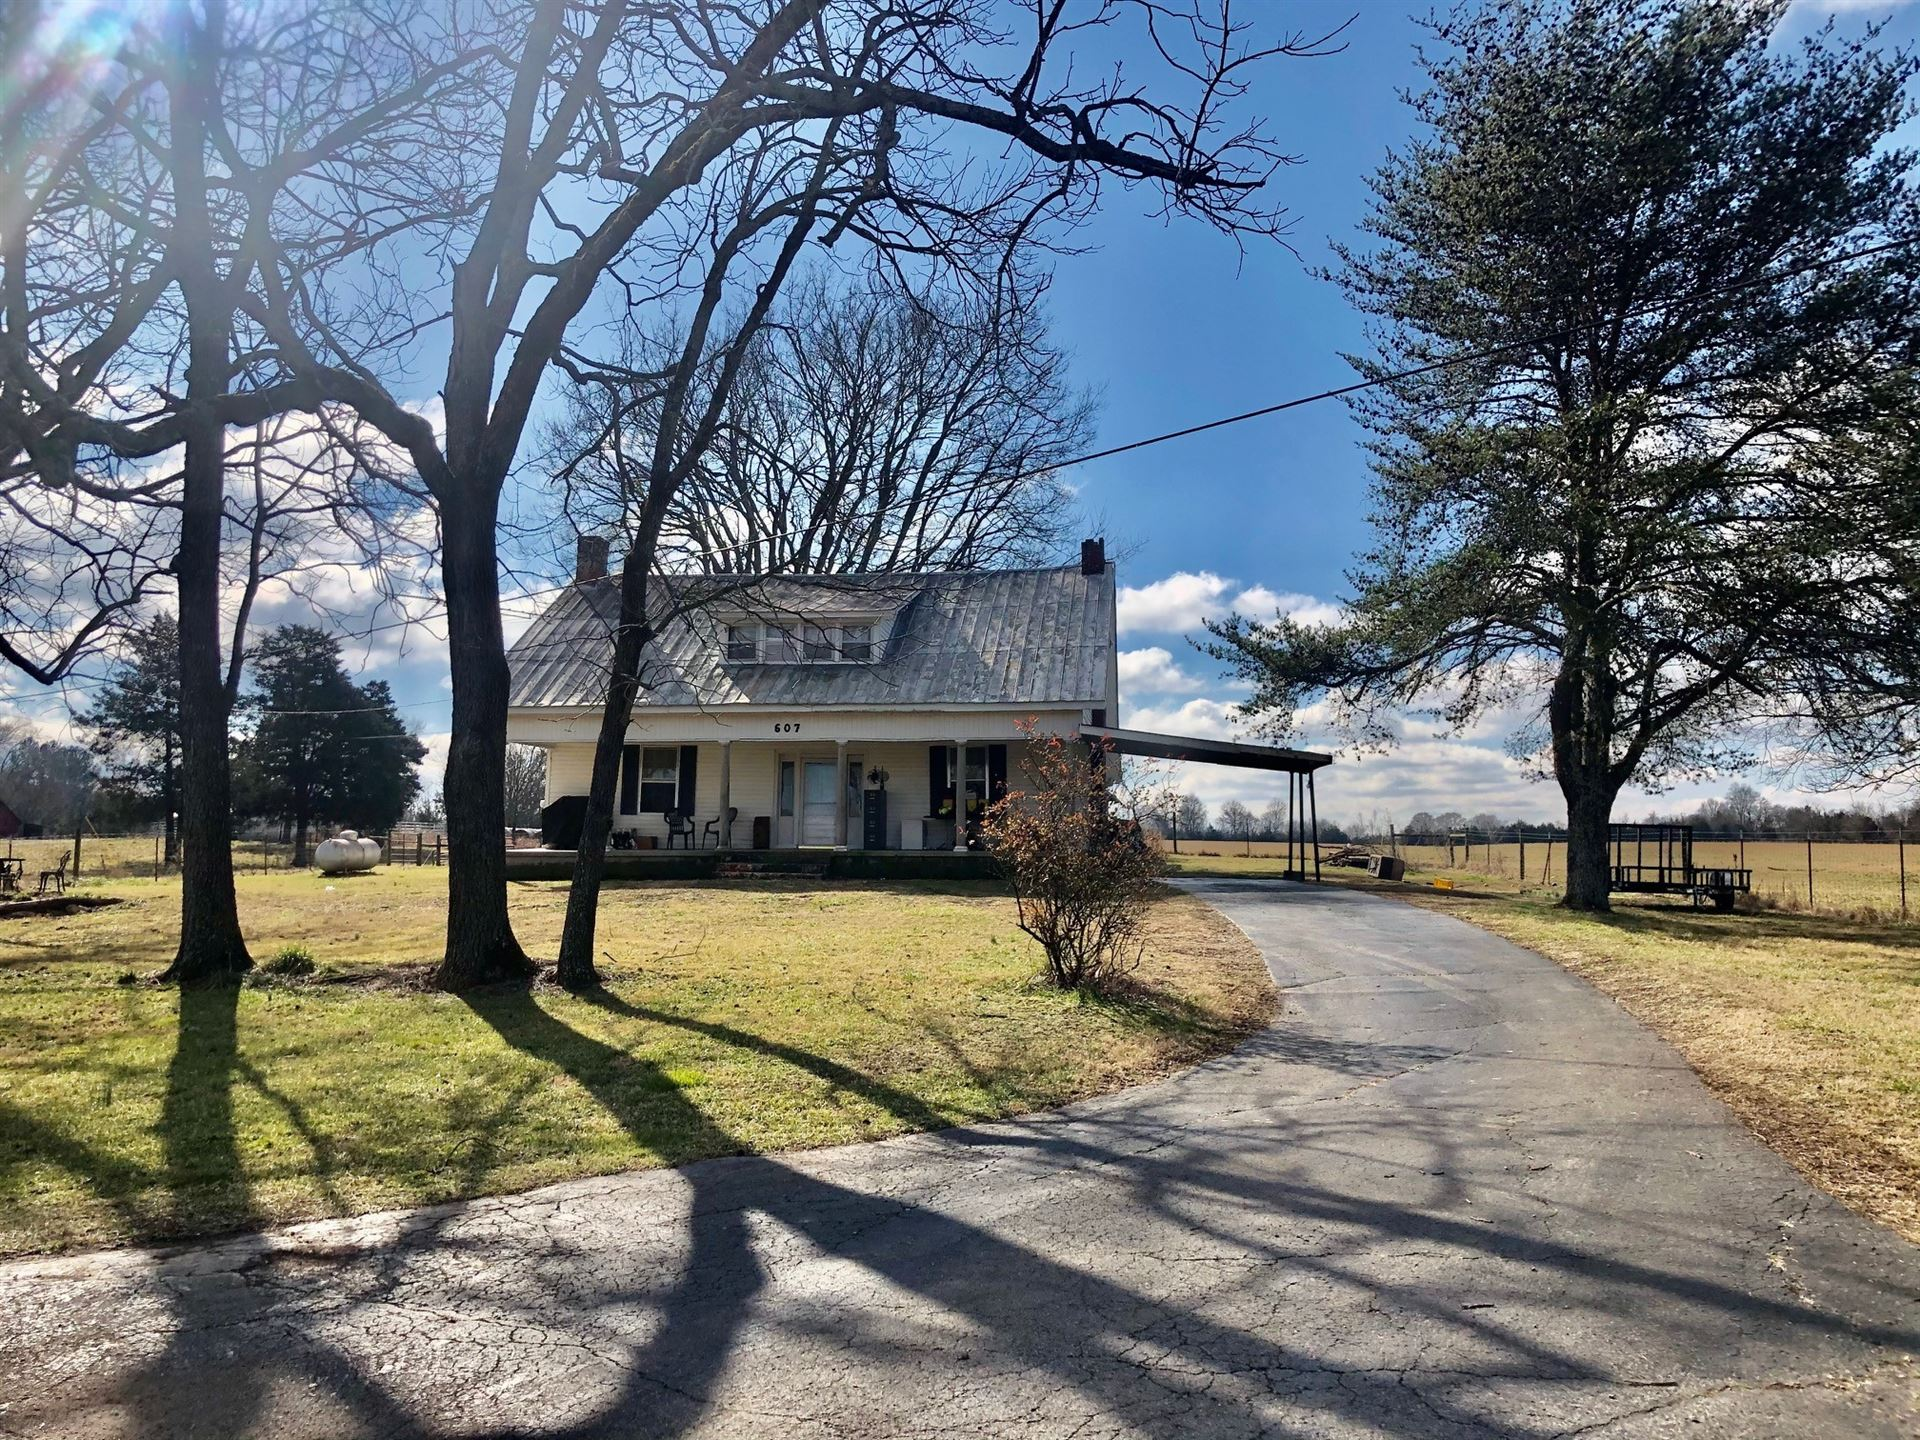 607 Old Columbia Rd, Unionville, TN 37180 - MLS#: 2224411